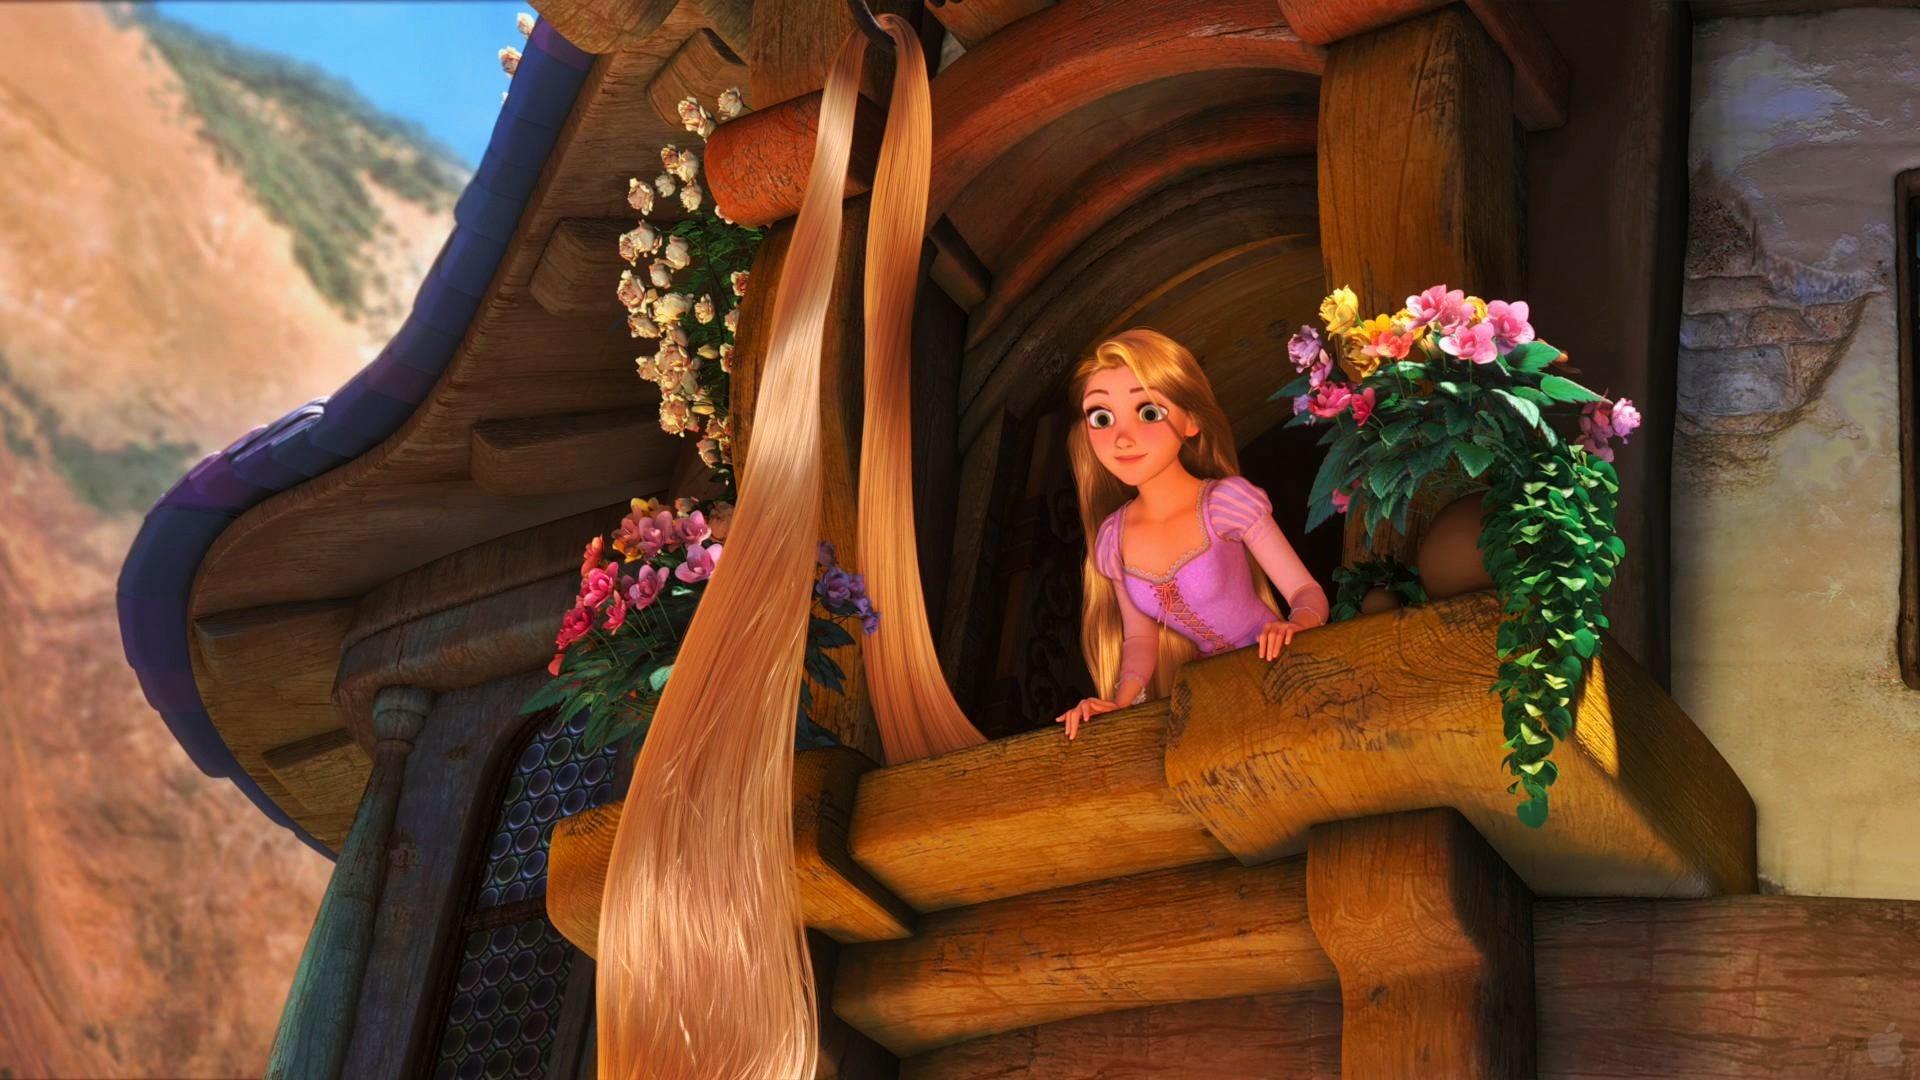 Tangled wallpaper hd 71 images - Rapunzel wallpaper ...